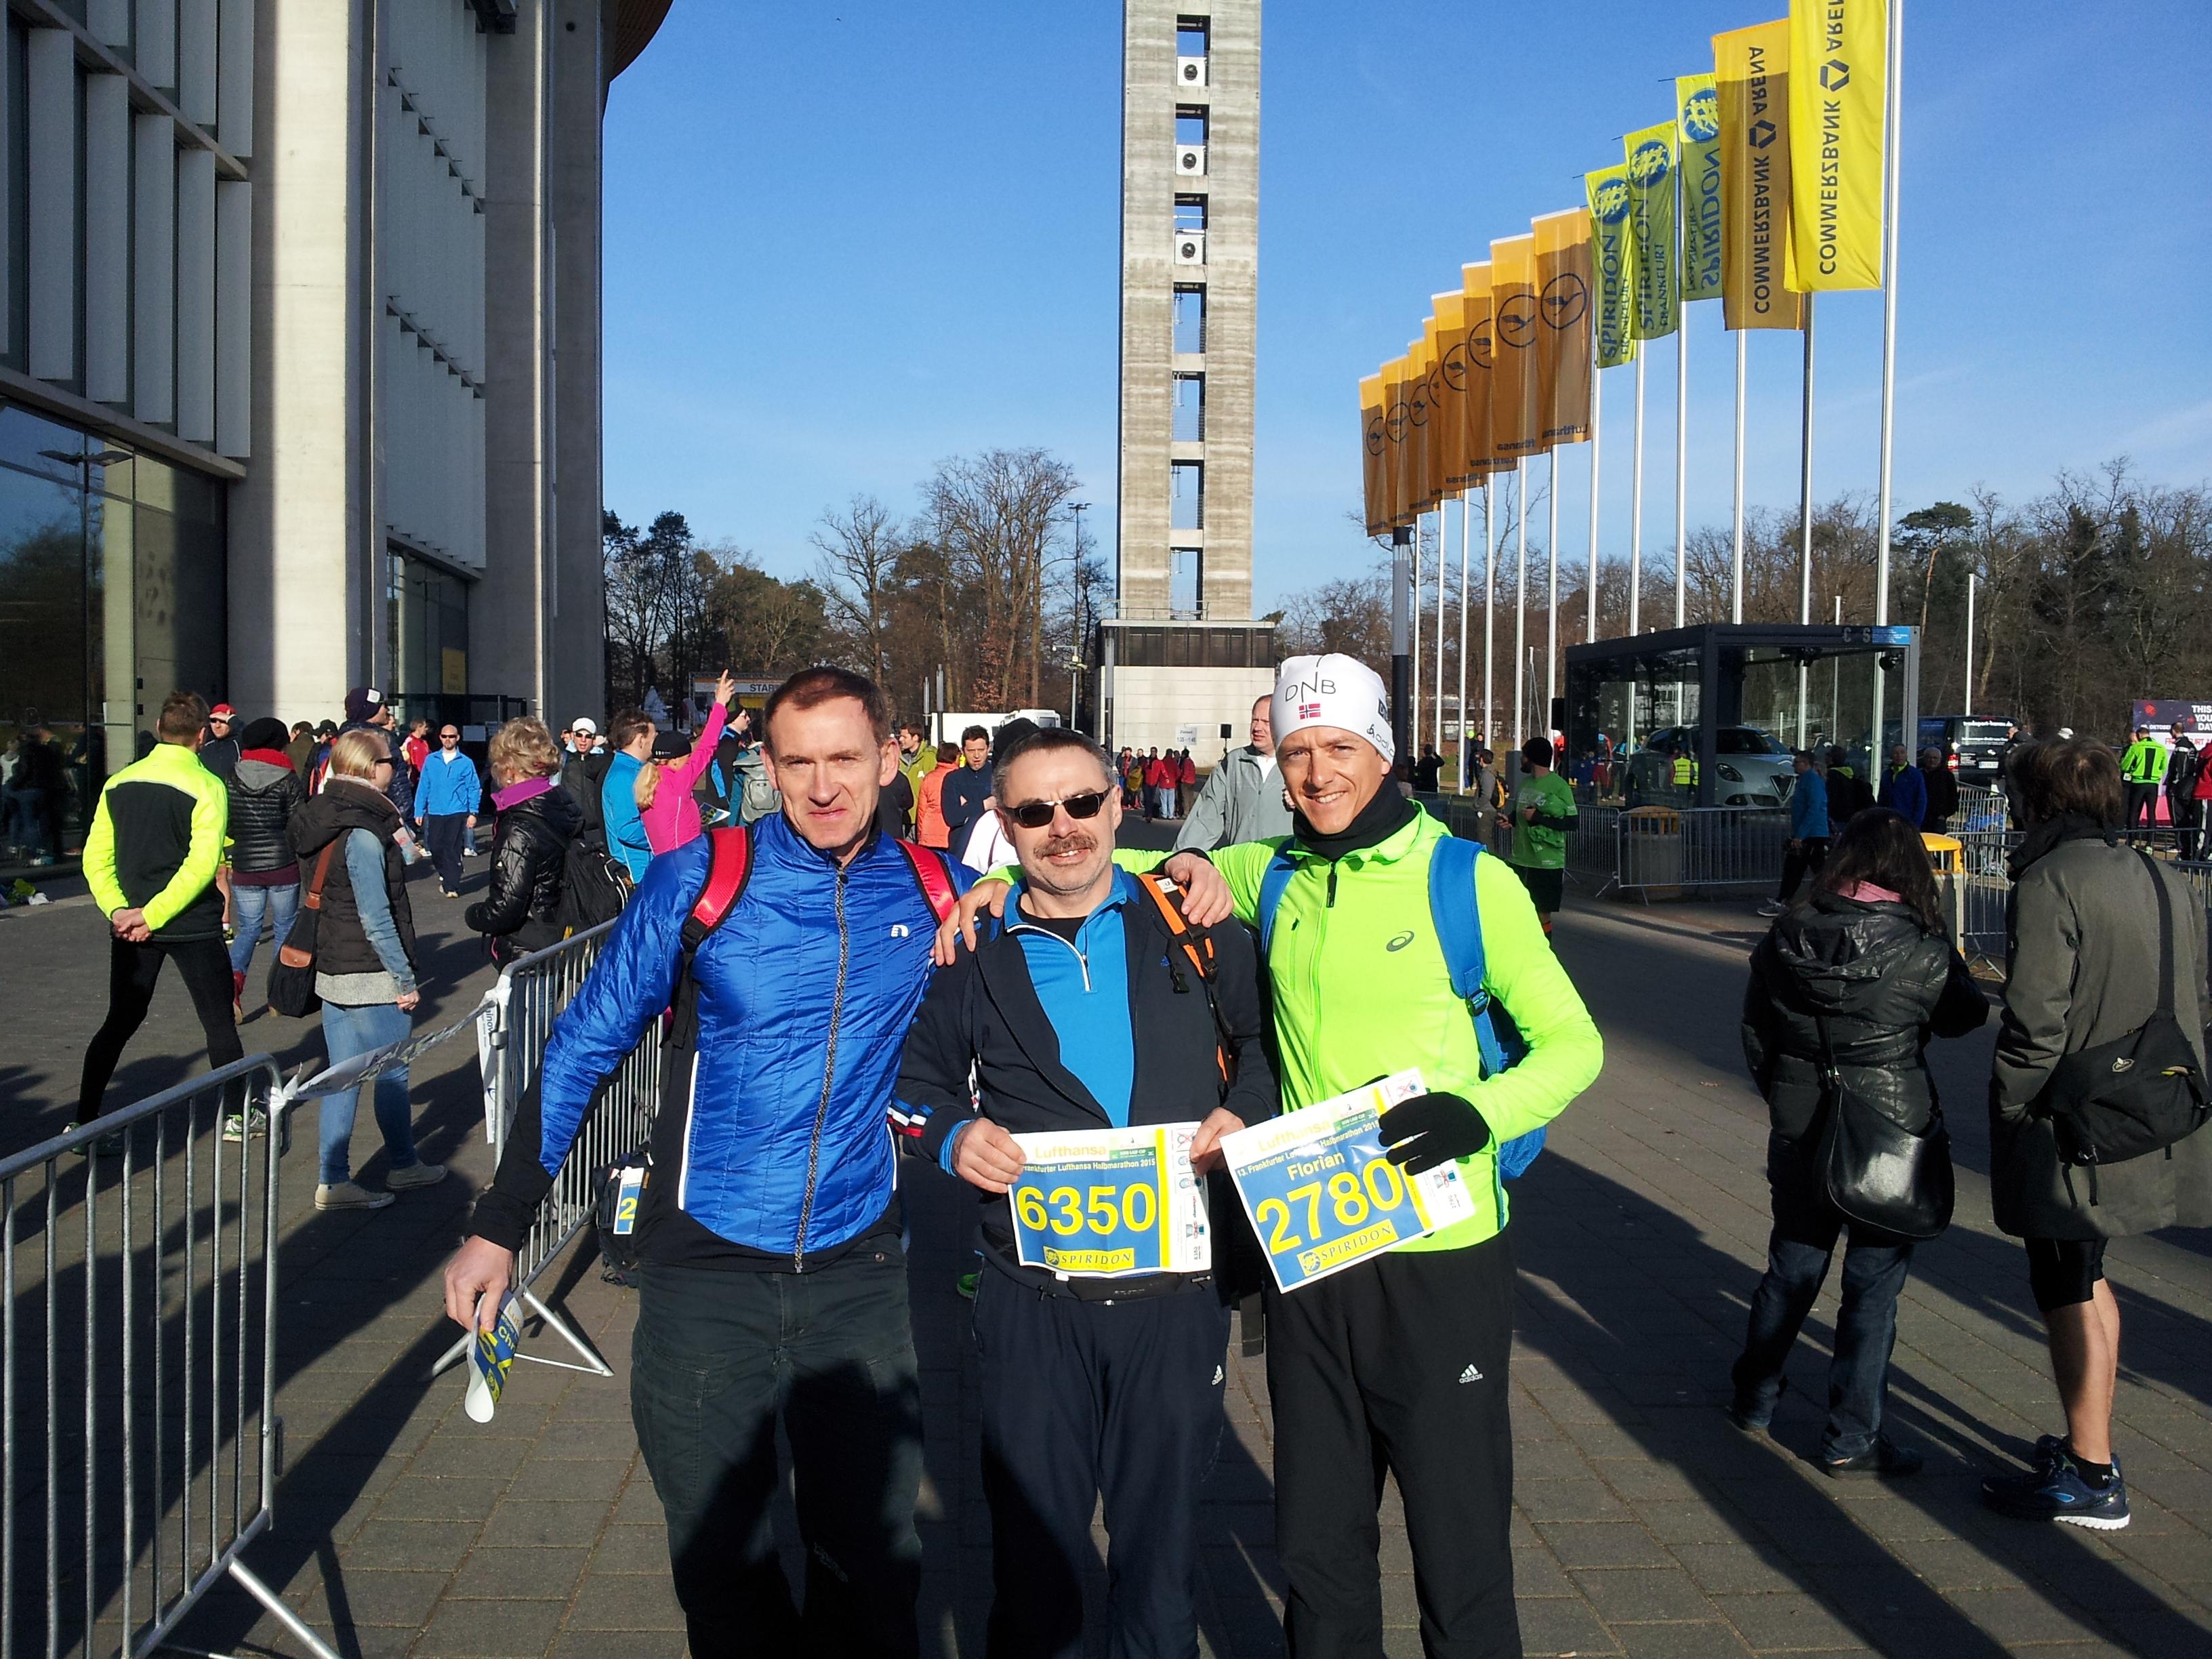 20150308_Halbmarathon_FFM.jpg